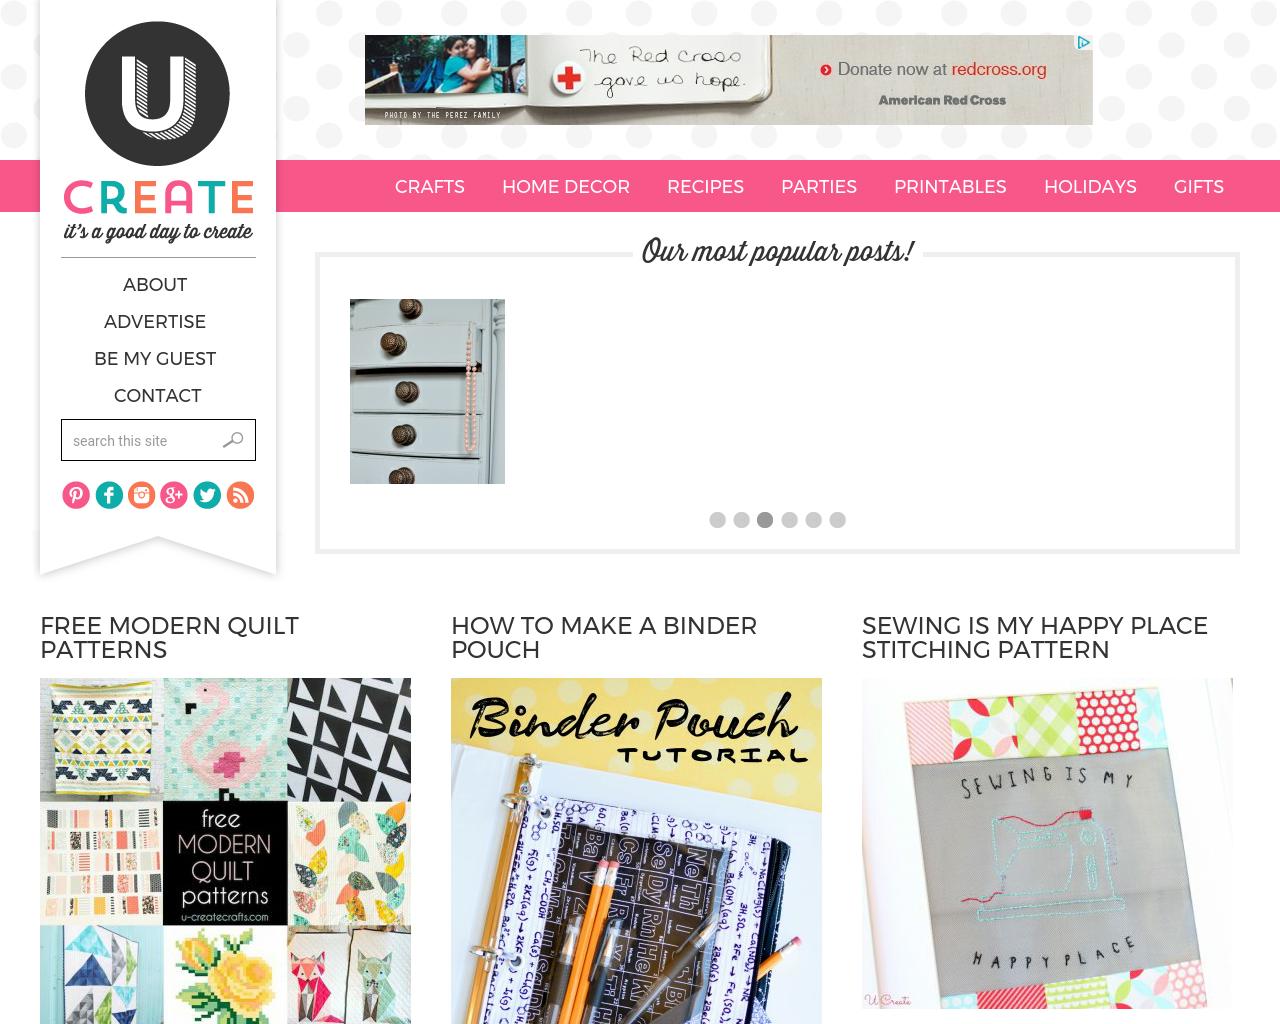 U-Create-Advertising-Reviews-Pricing